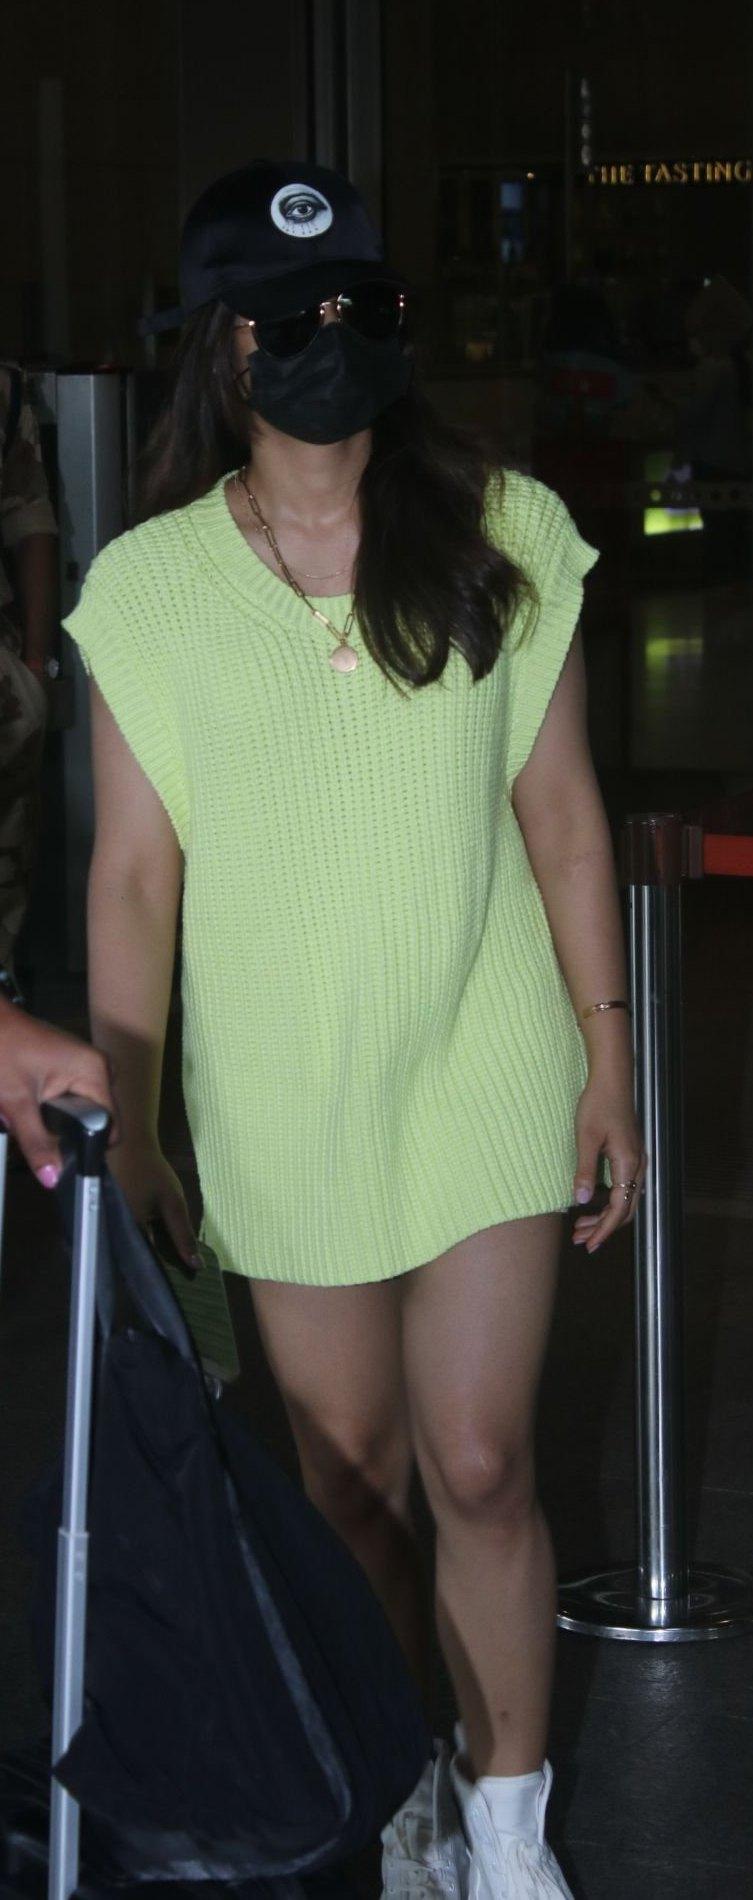 Rashmika Mandanna in a light yellow sweater dress at the airport